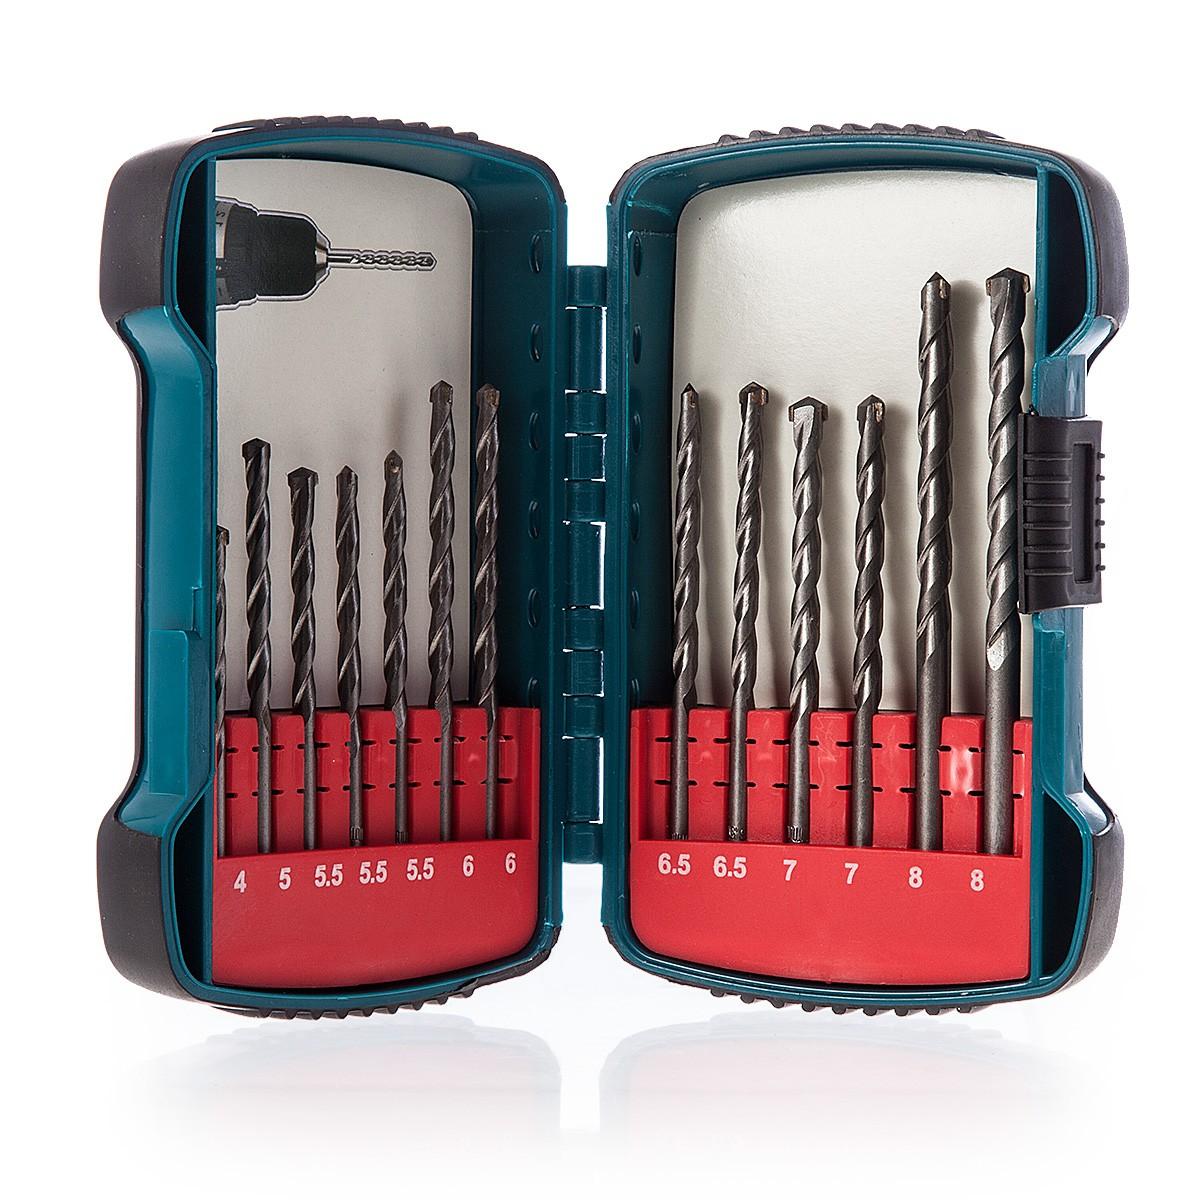 Makita 13 Piece 4mm to 8mm Masonry Drill Bit Set in Case - P-51889